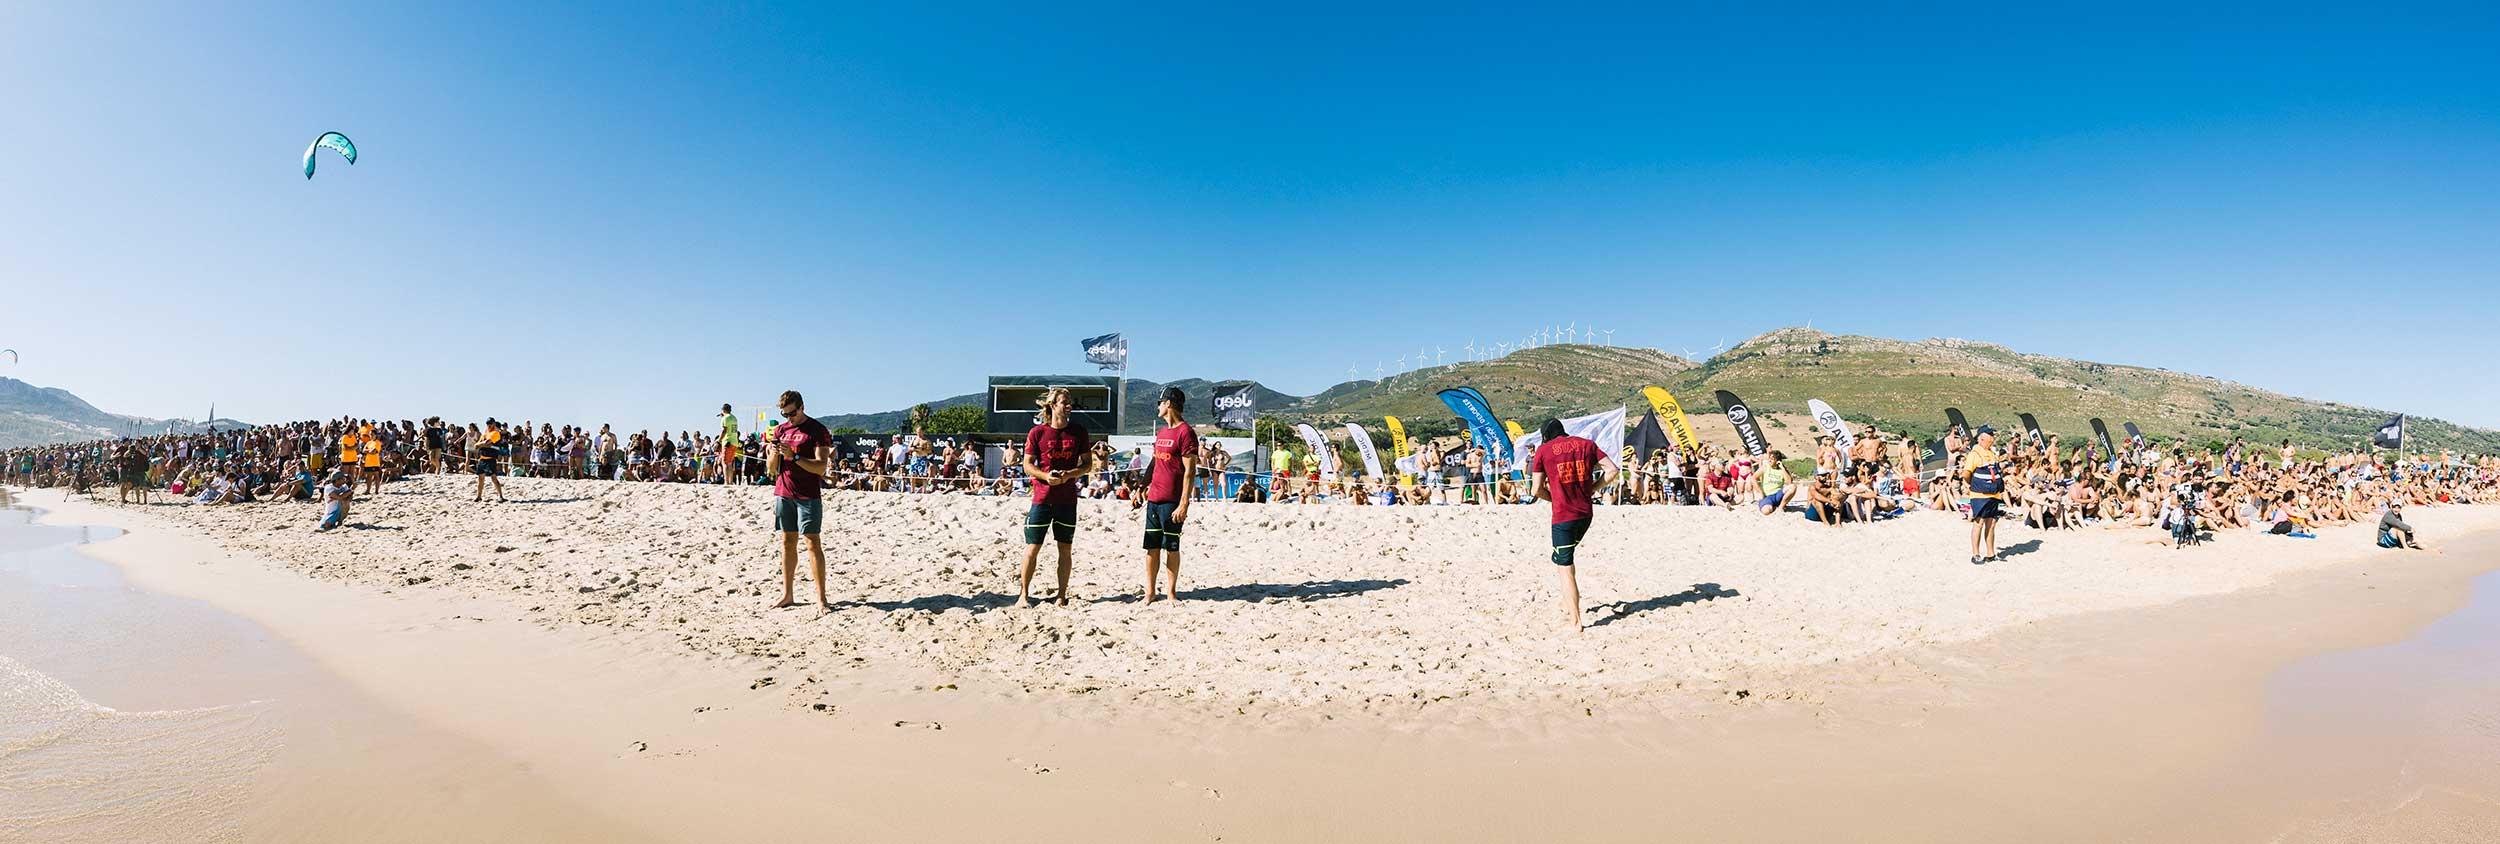 Tarifa-2018-Strapless-World-kitesurfing